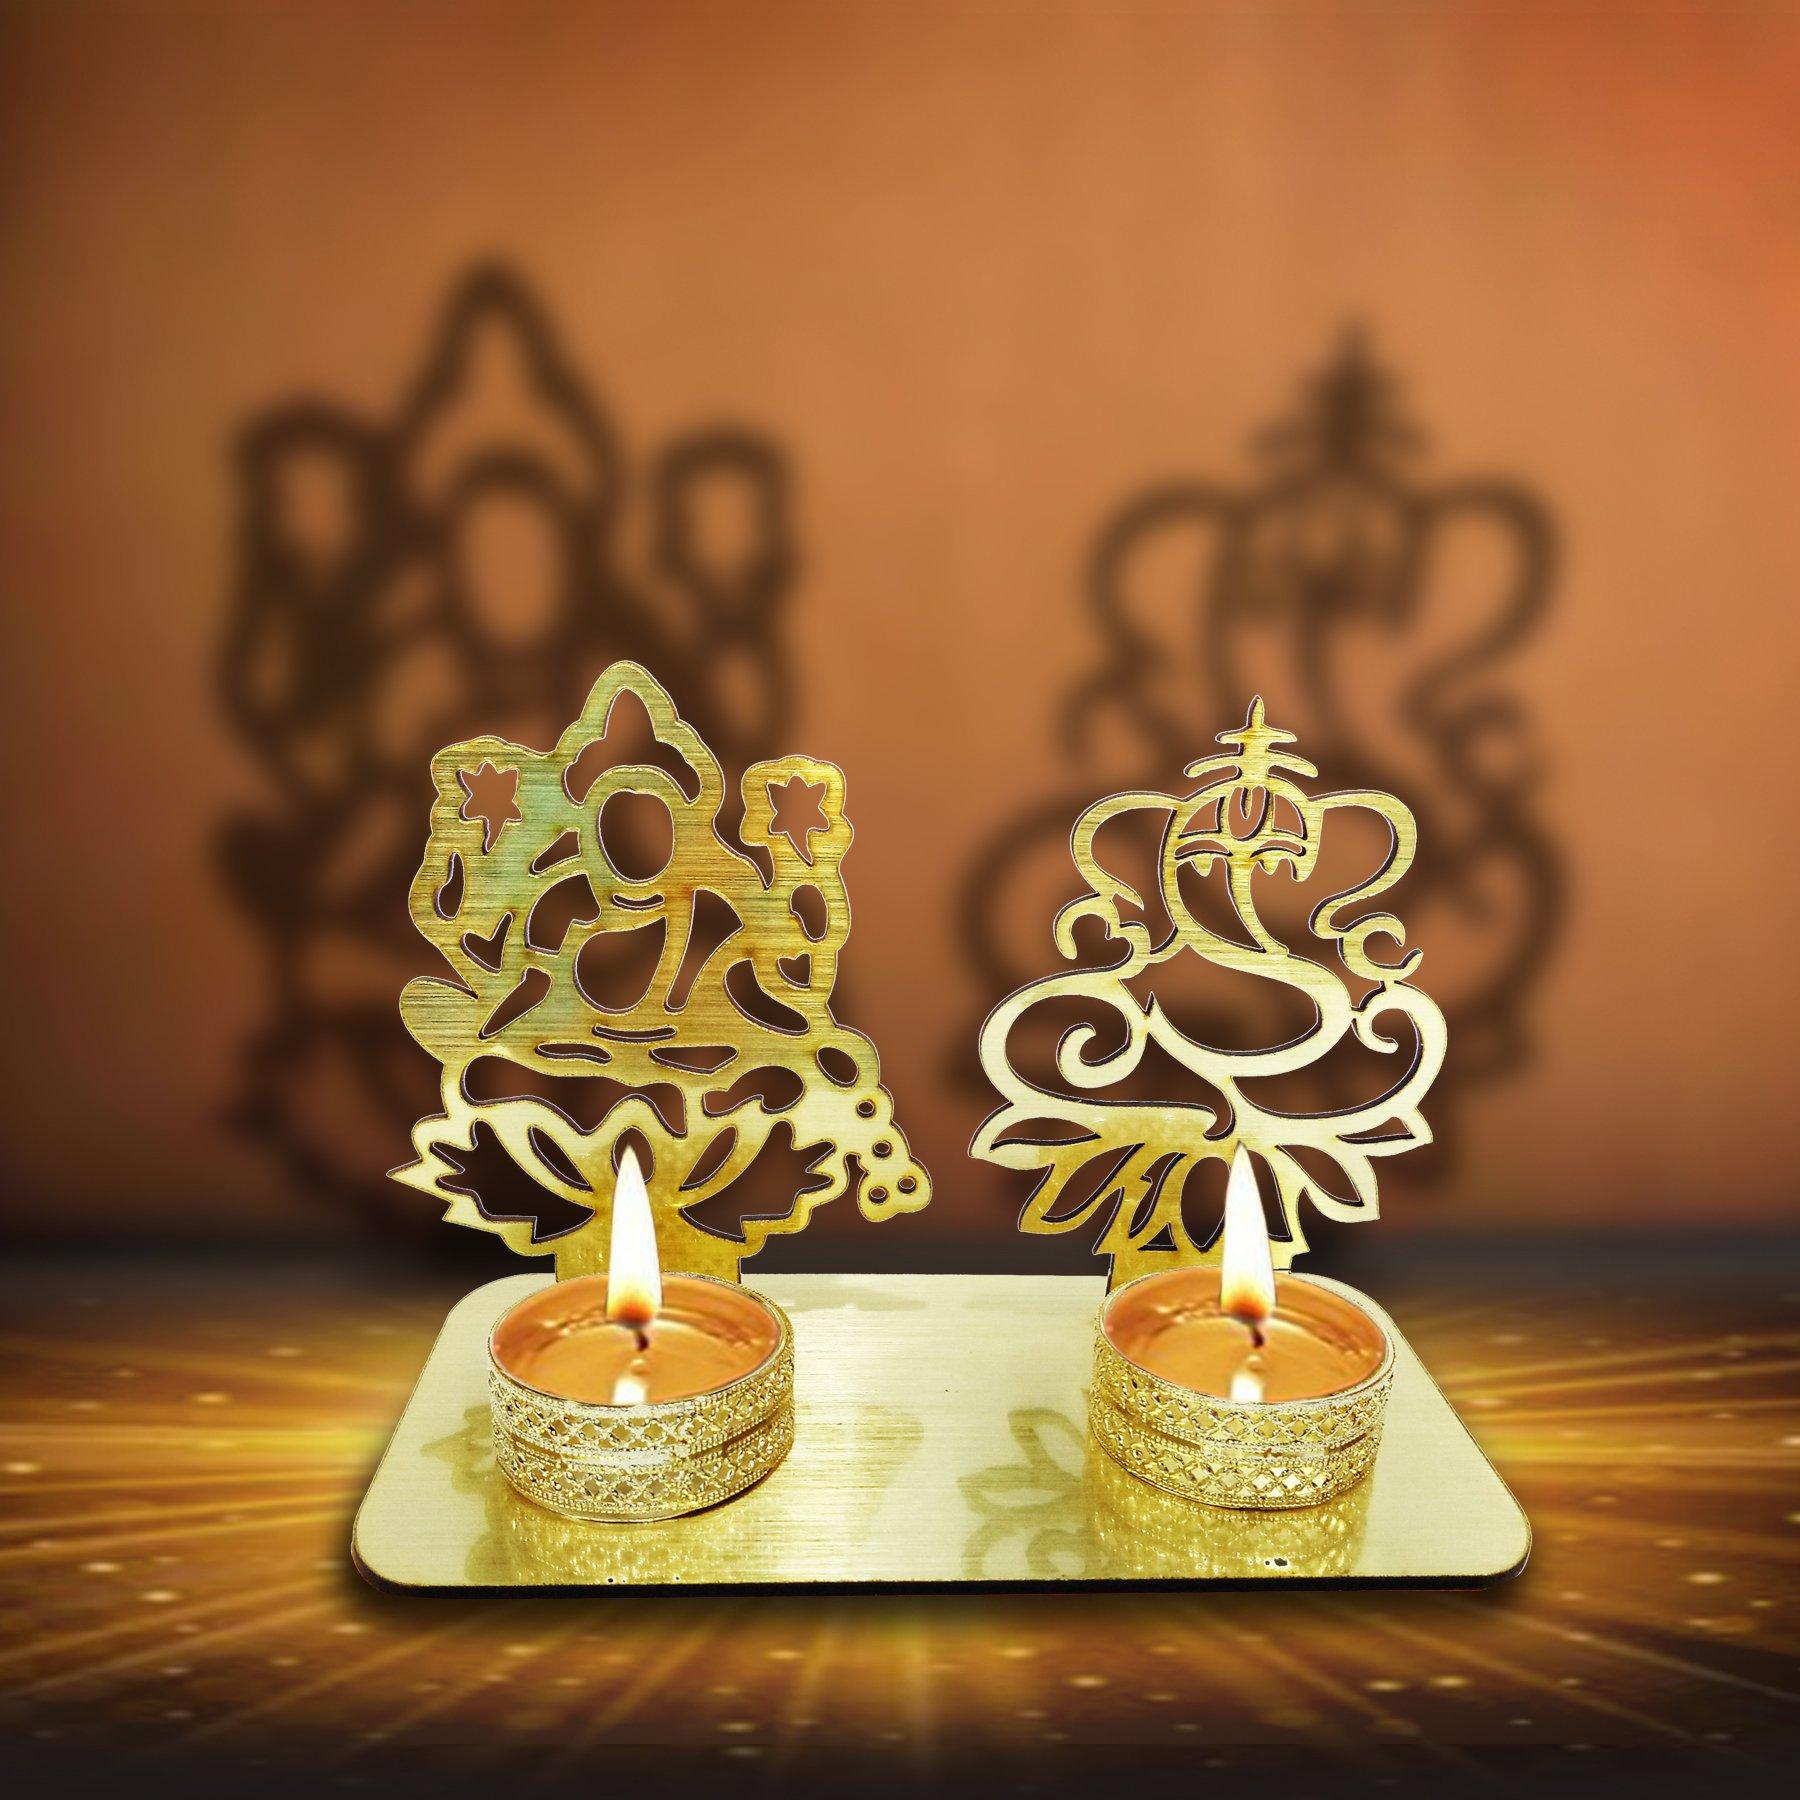 Lakshmi Ganesha ( Shubh Labh) Diwali Shadow Diya. Deepawali Traditional Decorative Diya in Laxmi Ganesh Statue for Home/Office..Religious Tea Light Candle Holder Stand. Diwali Decoration Diwali Gift